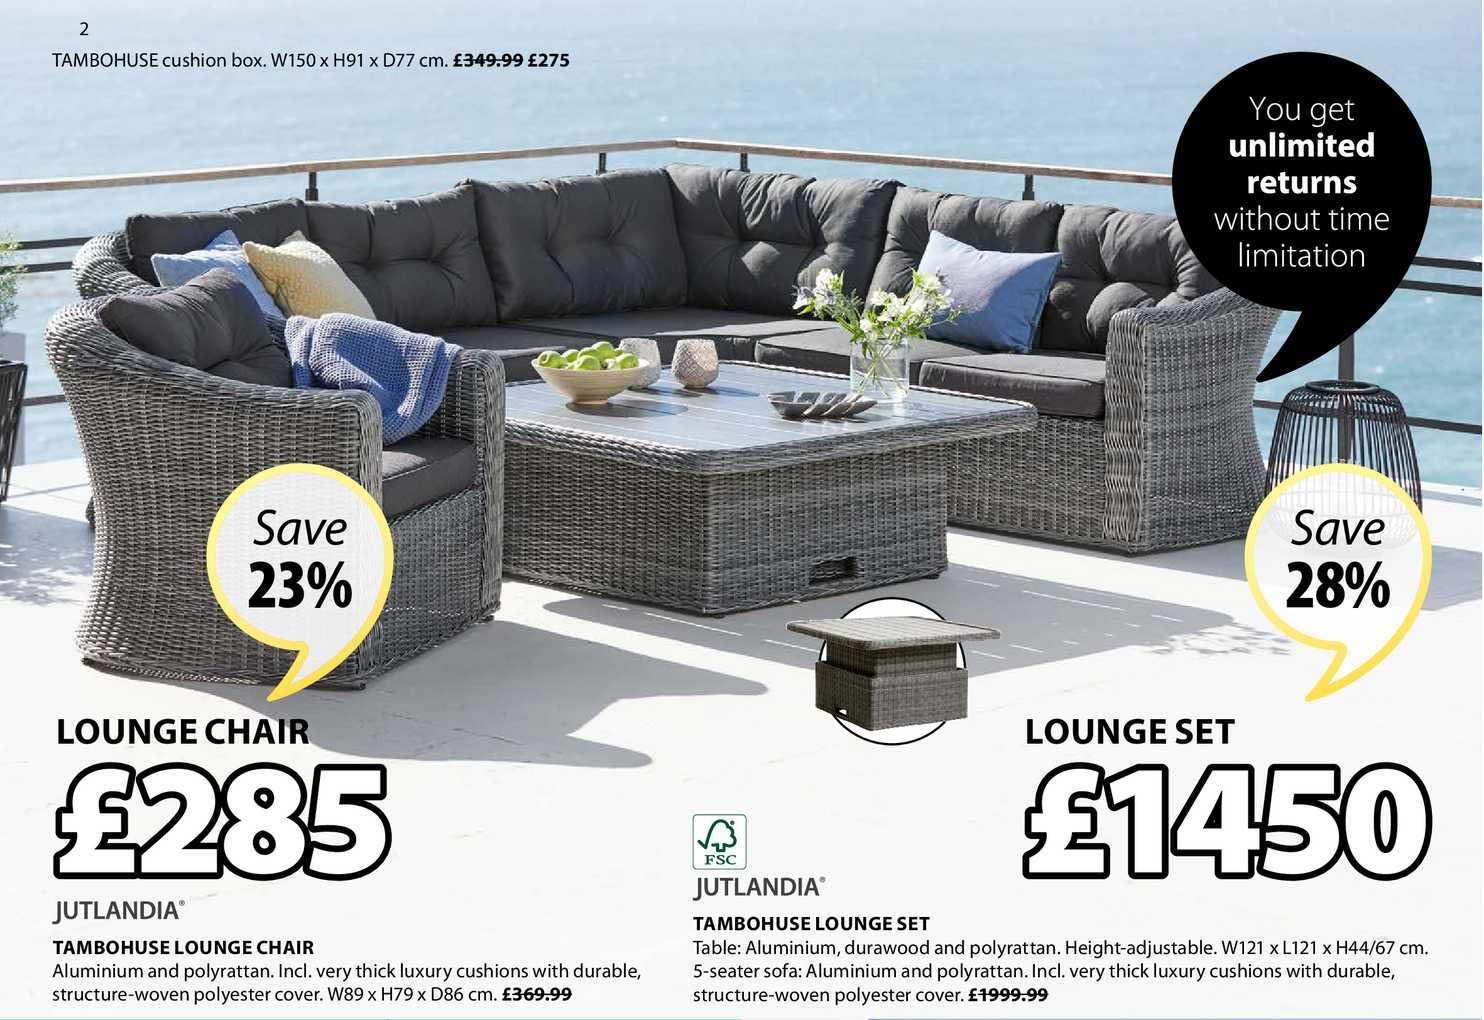 JYSK Tambohuse Lounge Chair , Tambohuse Lounge Set